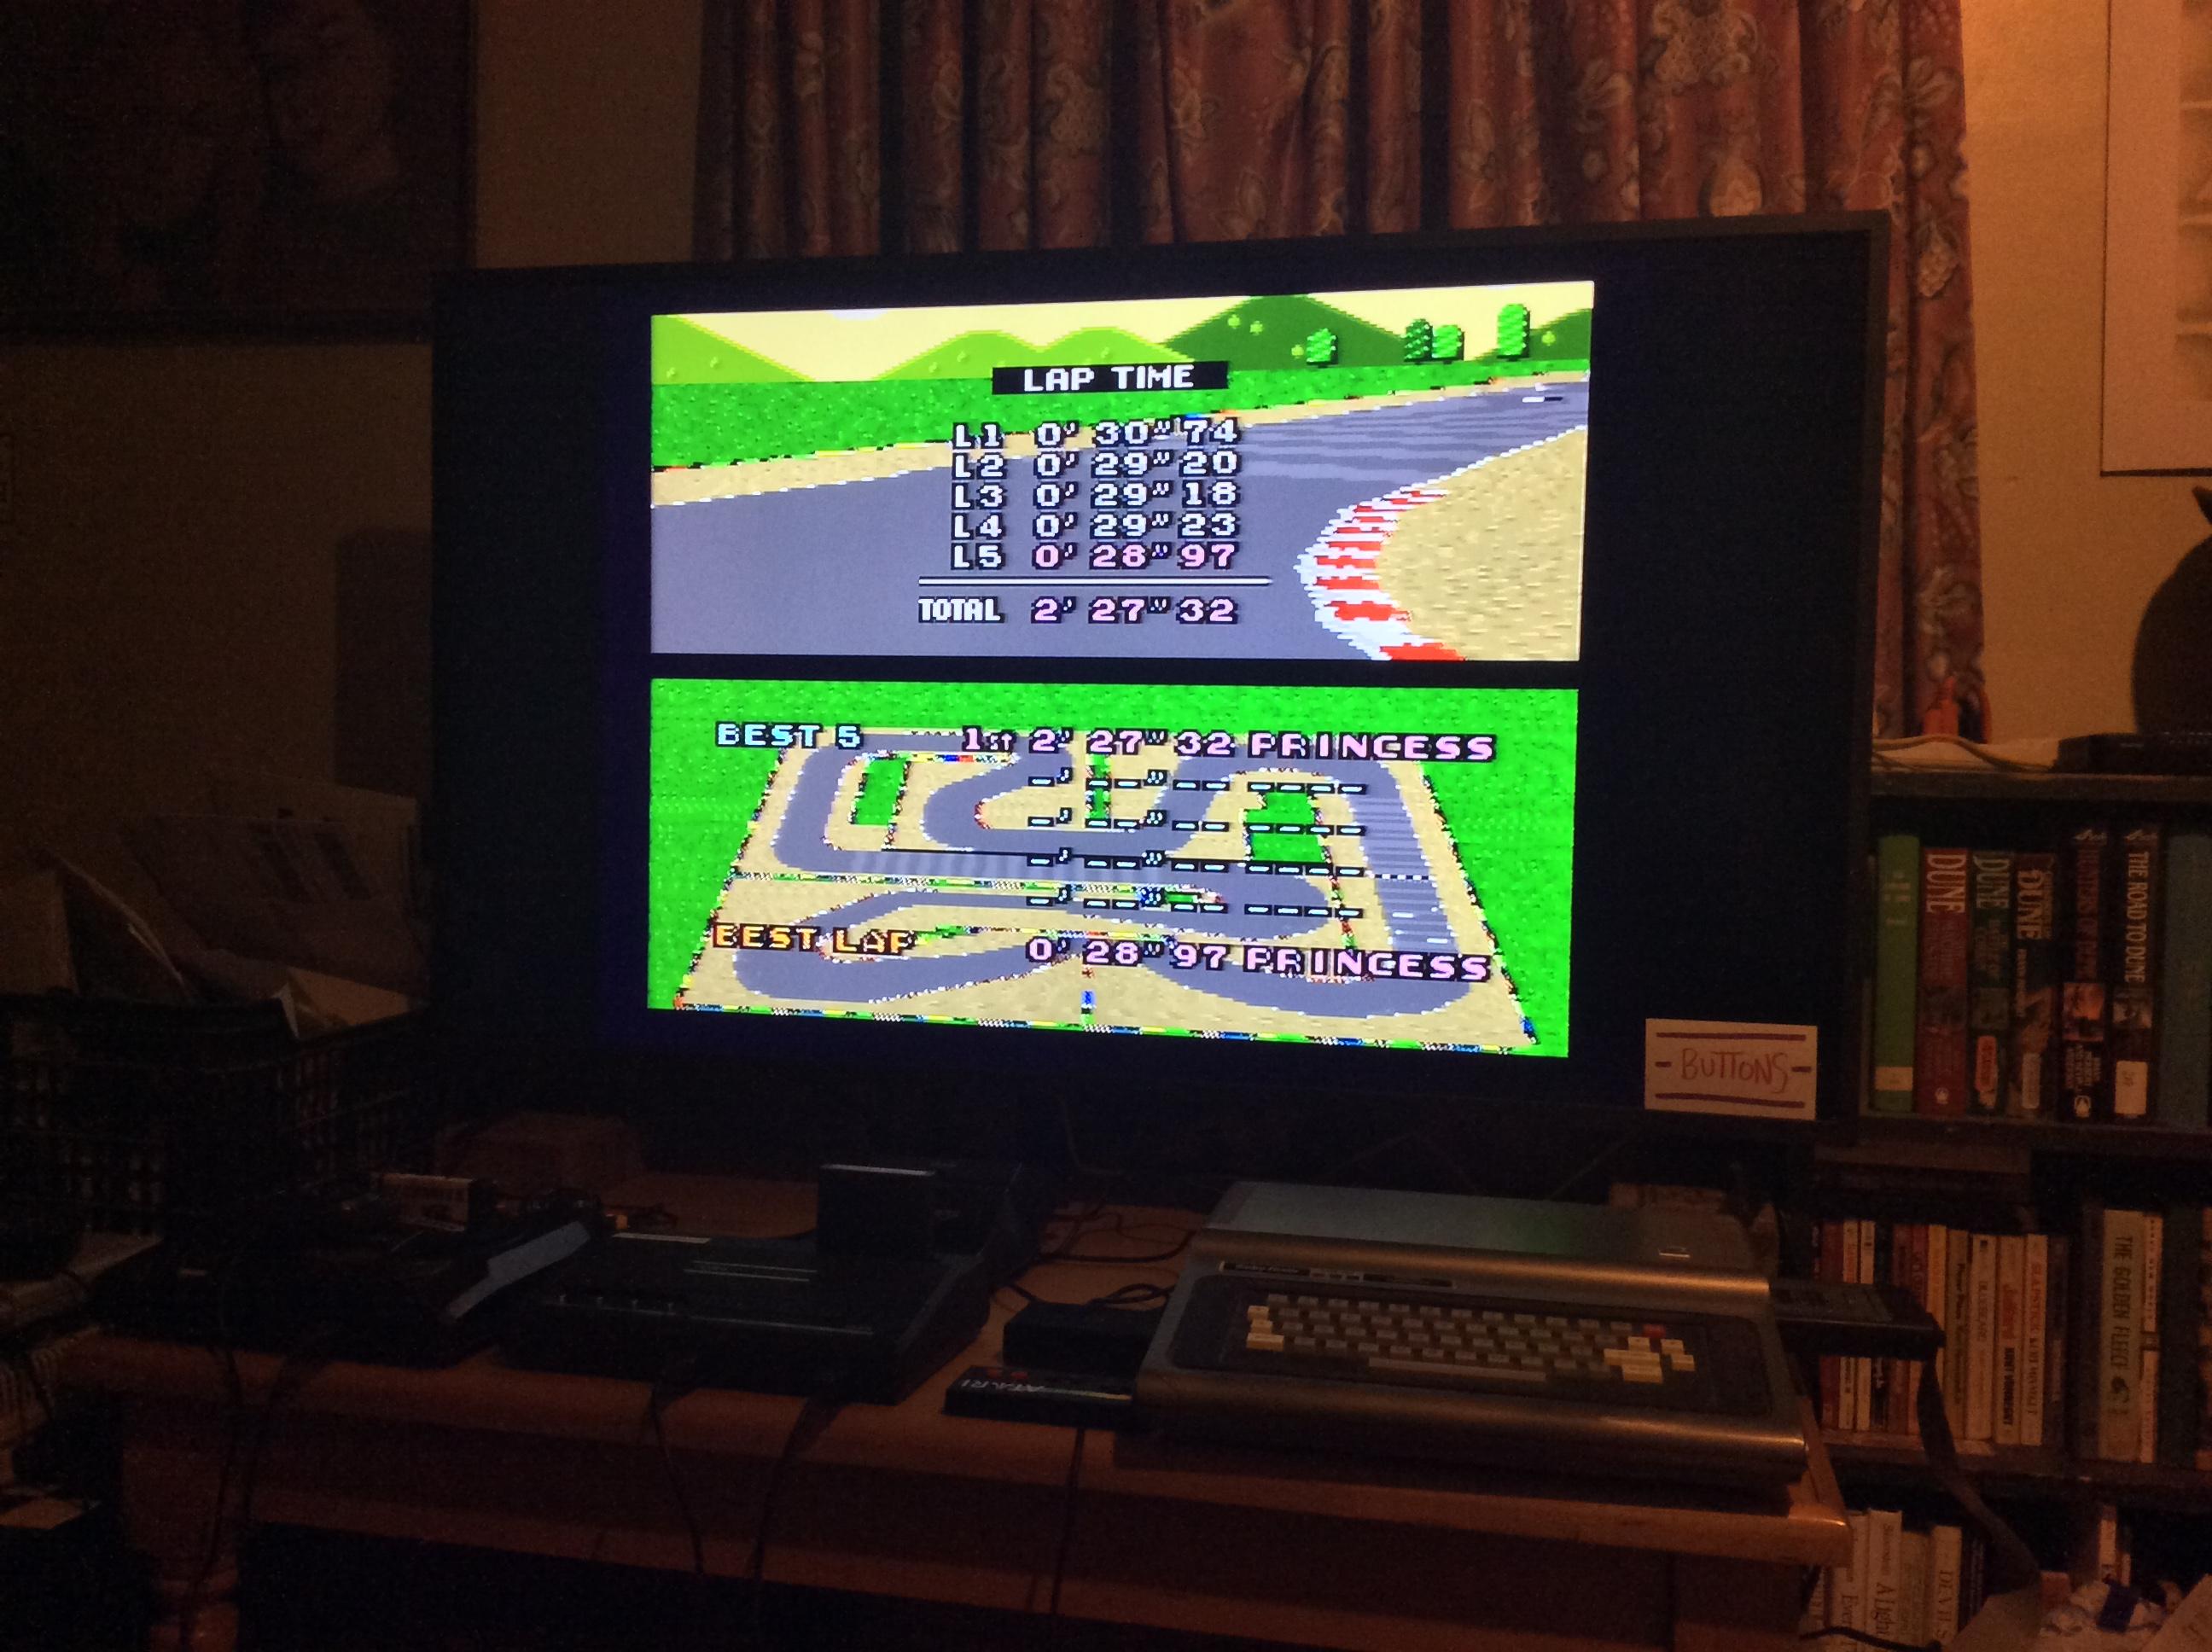 Super Mario Kart: Mario Circuit 4 [Time Trial] time of 0:02:27.32